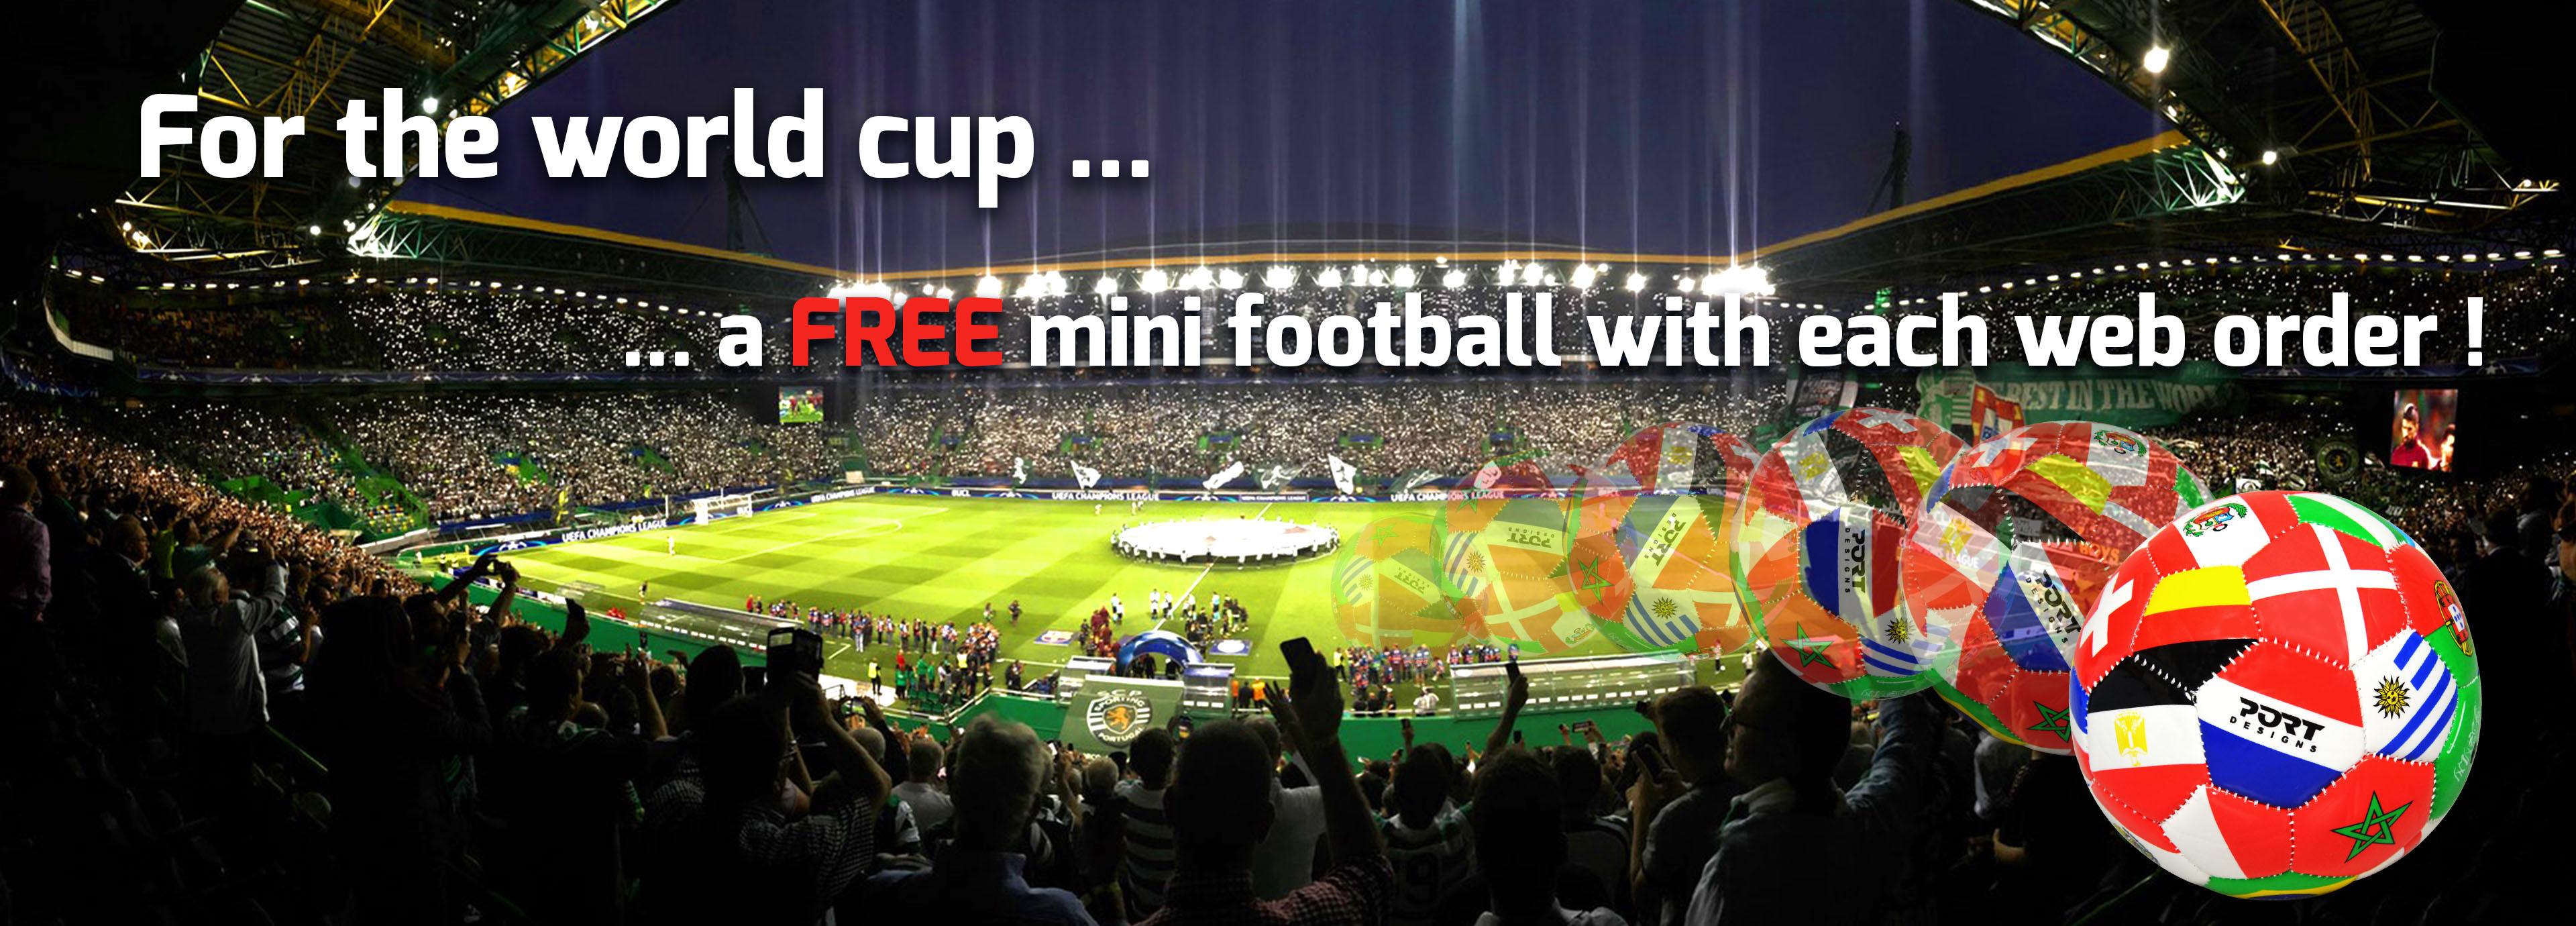 World Cup promo